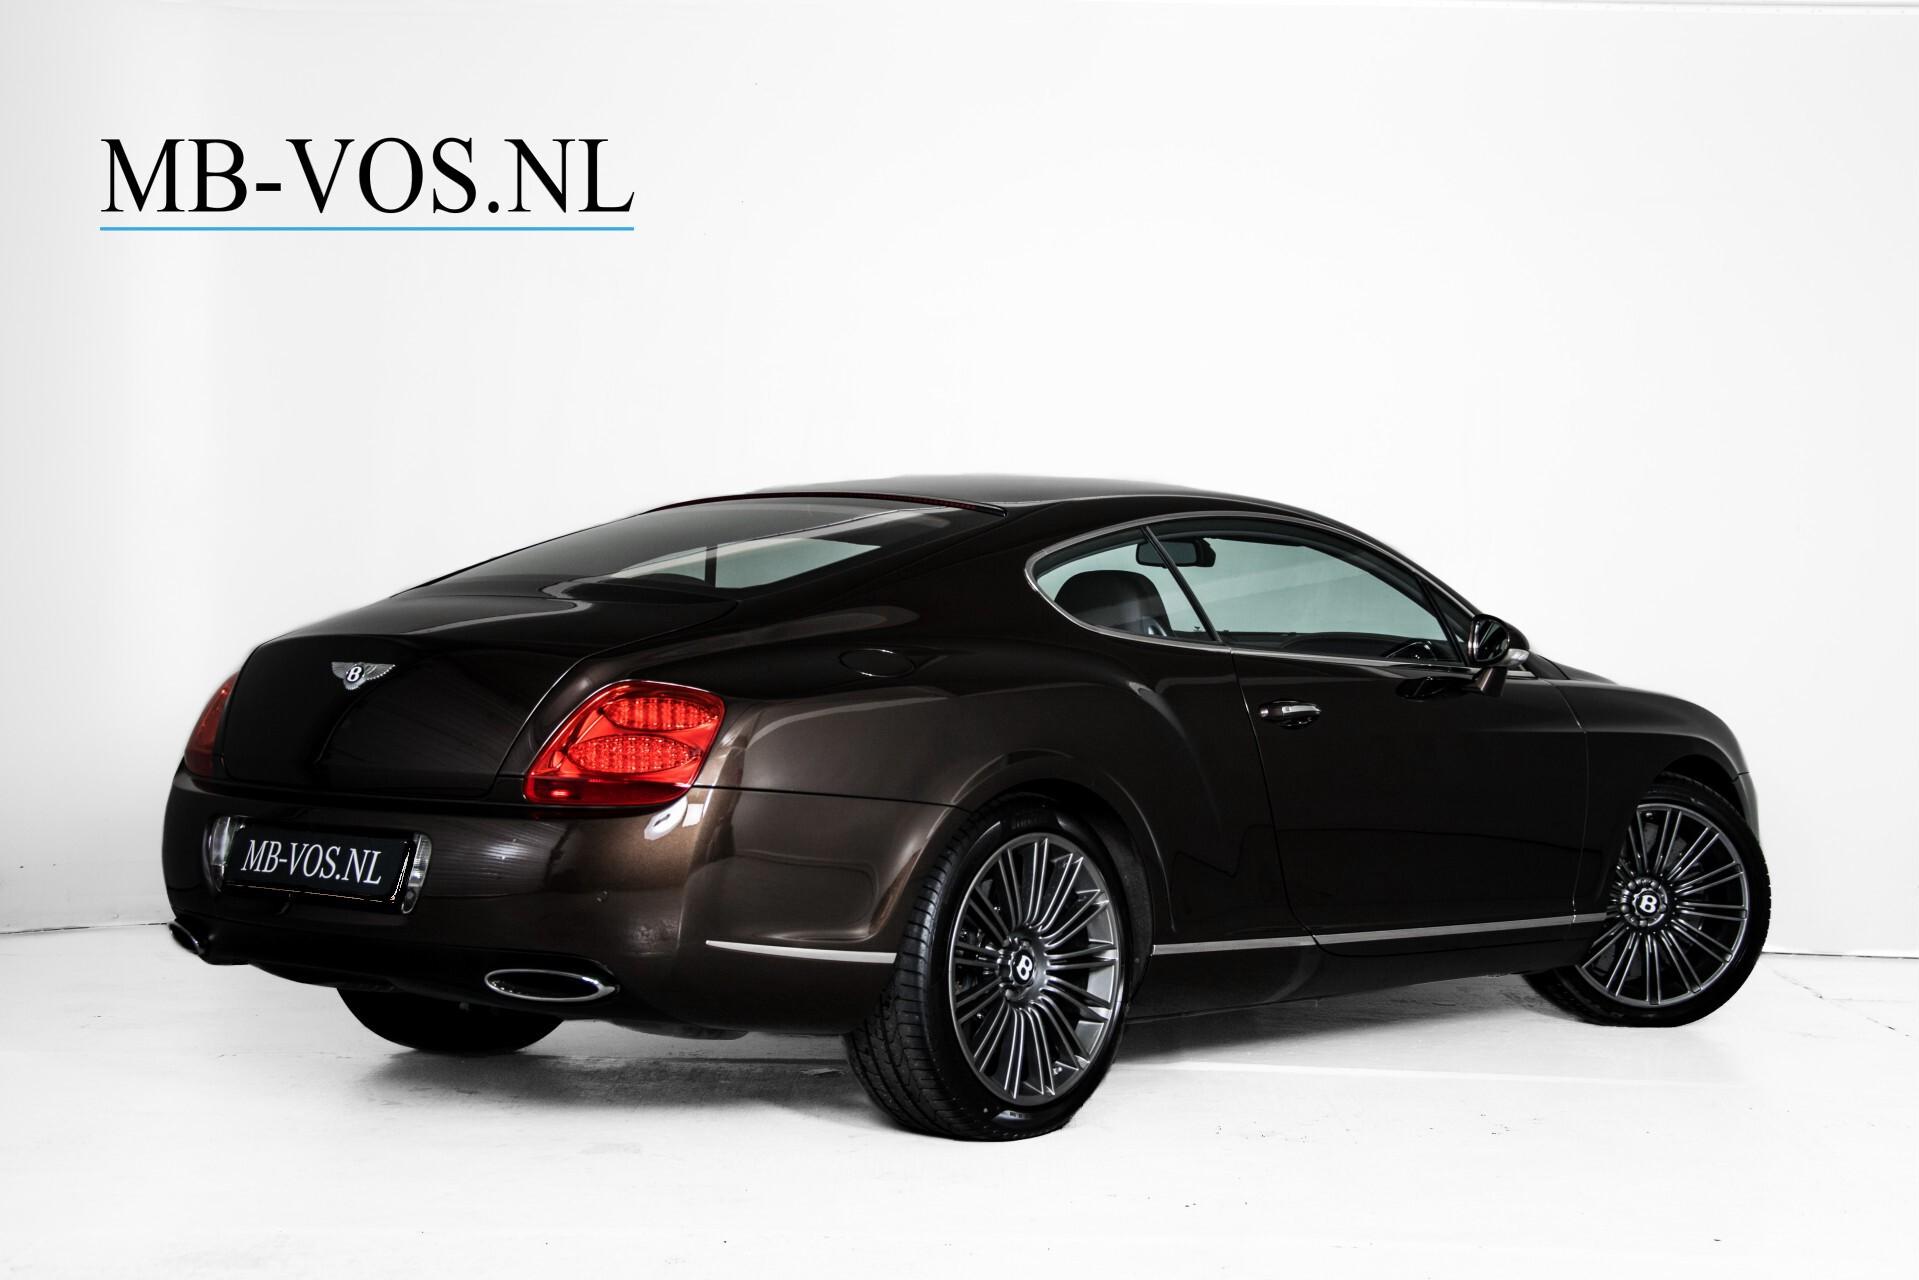 Bentley Continental GT 6.0 W12 GT Speed Ceramic Brakes/Mulliner/Standkachel/Keyless Aut6 Foto 2